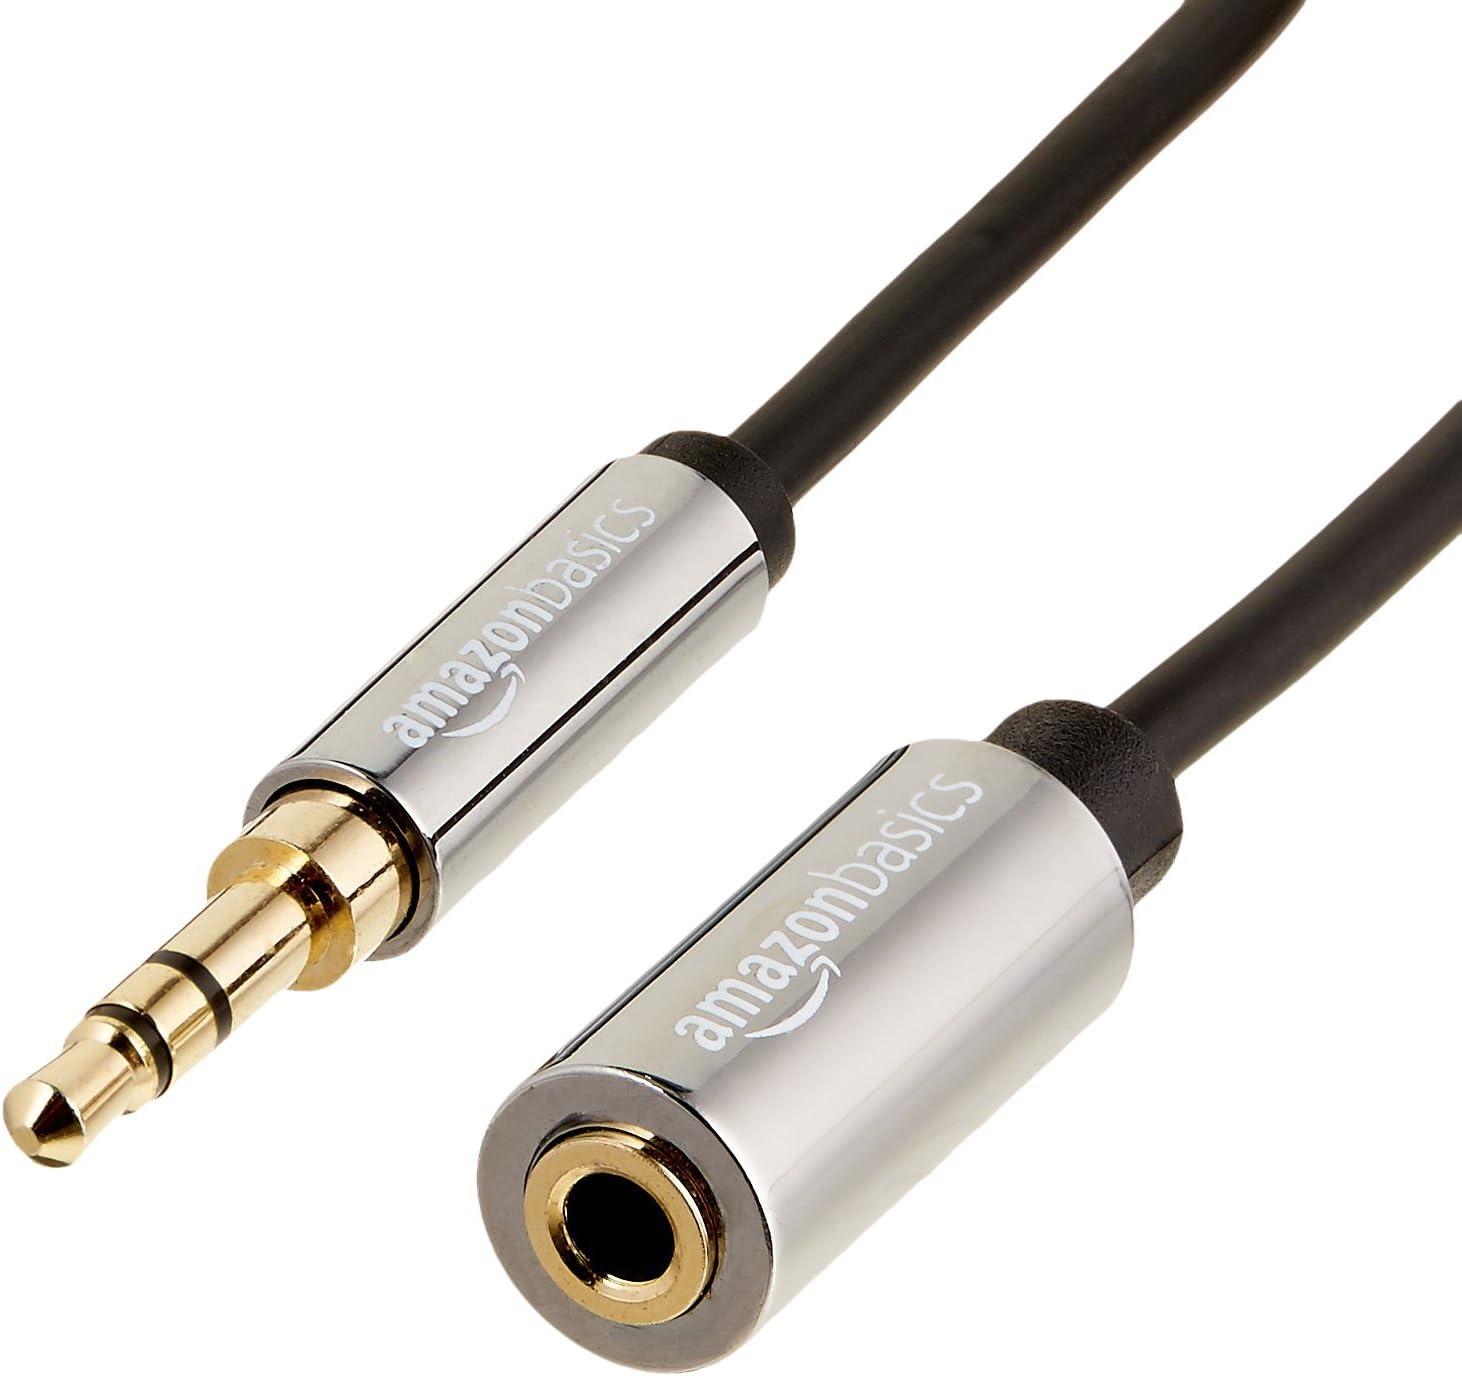 Amazon Basics Stereo Audio Verlängerungskabel Stecker Elektronik